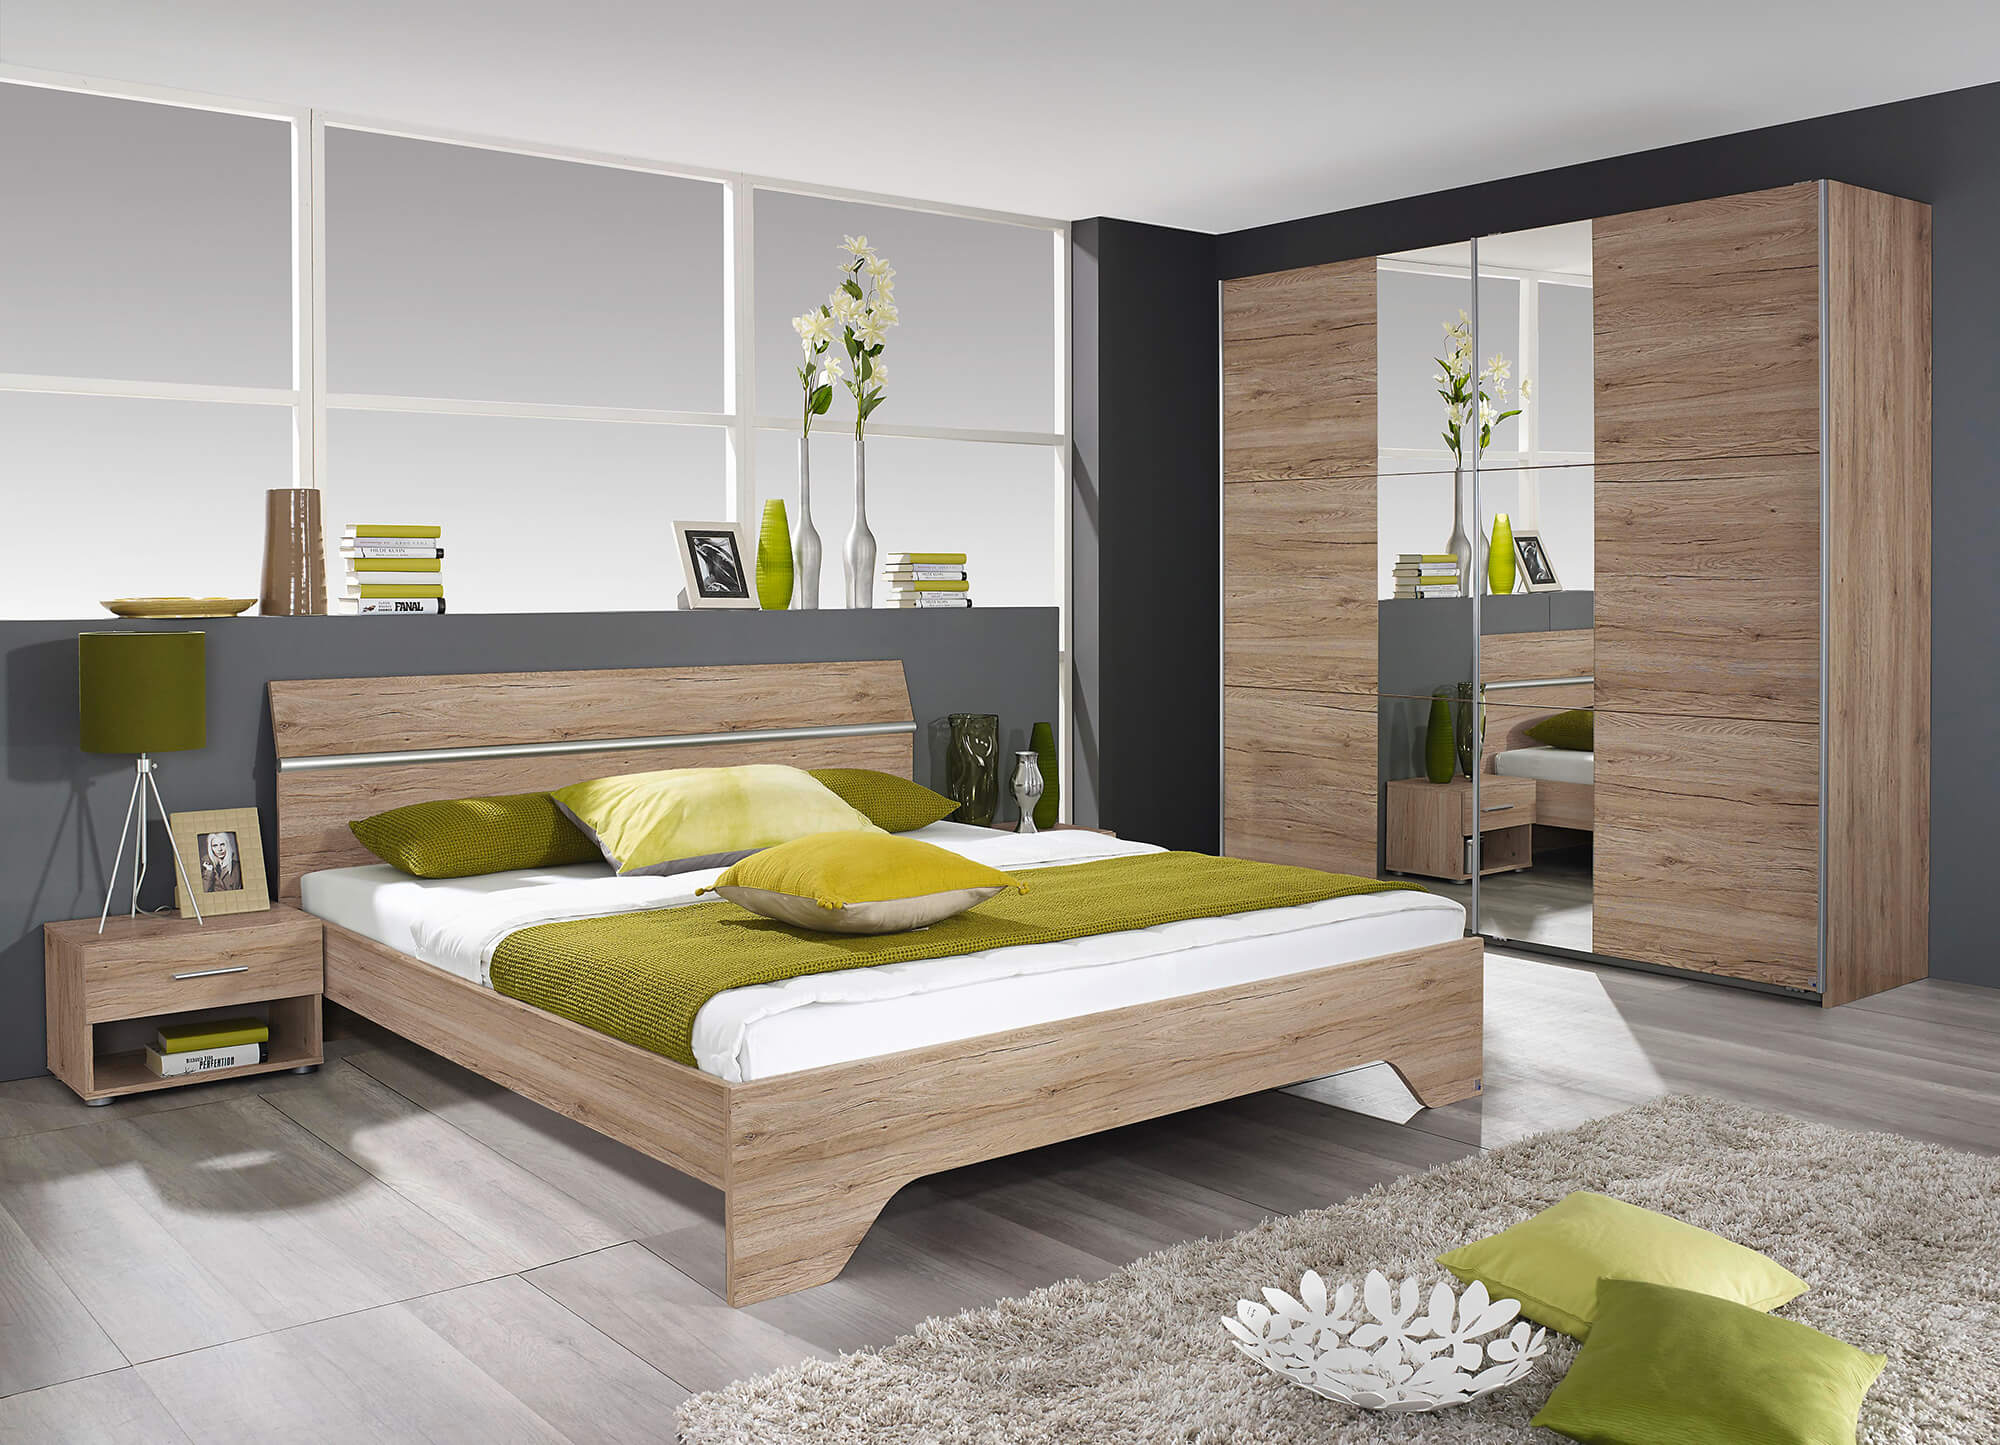 Slaapkamer Felbach, bed 160x200 + 2 nachttafels + kommode + kledingkast 220 cm